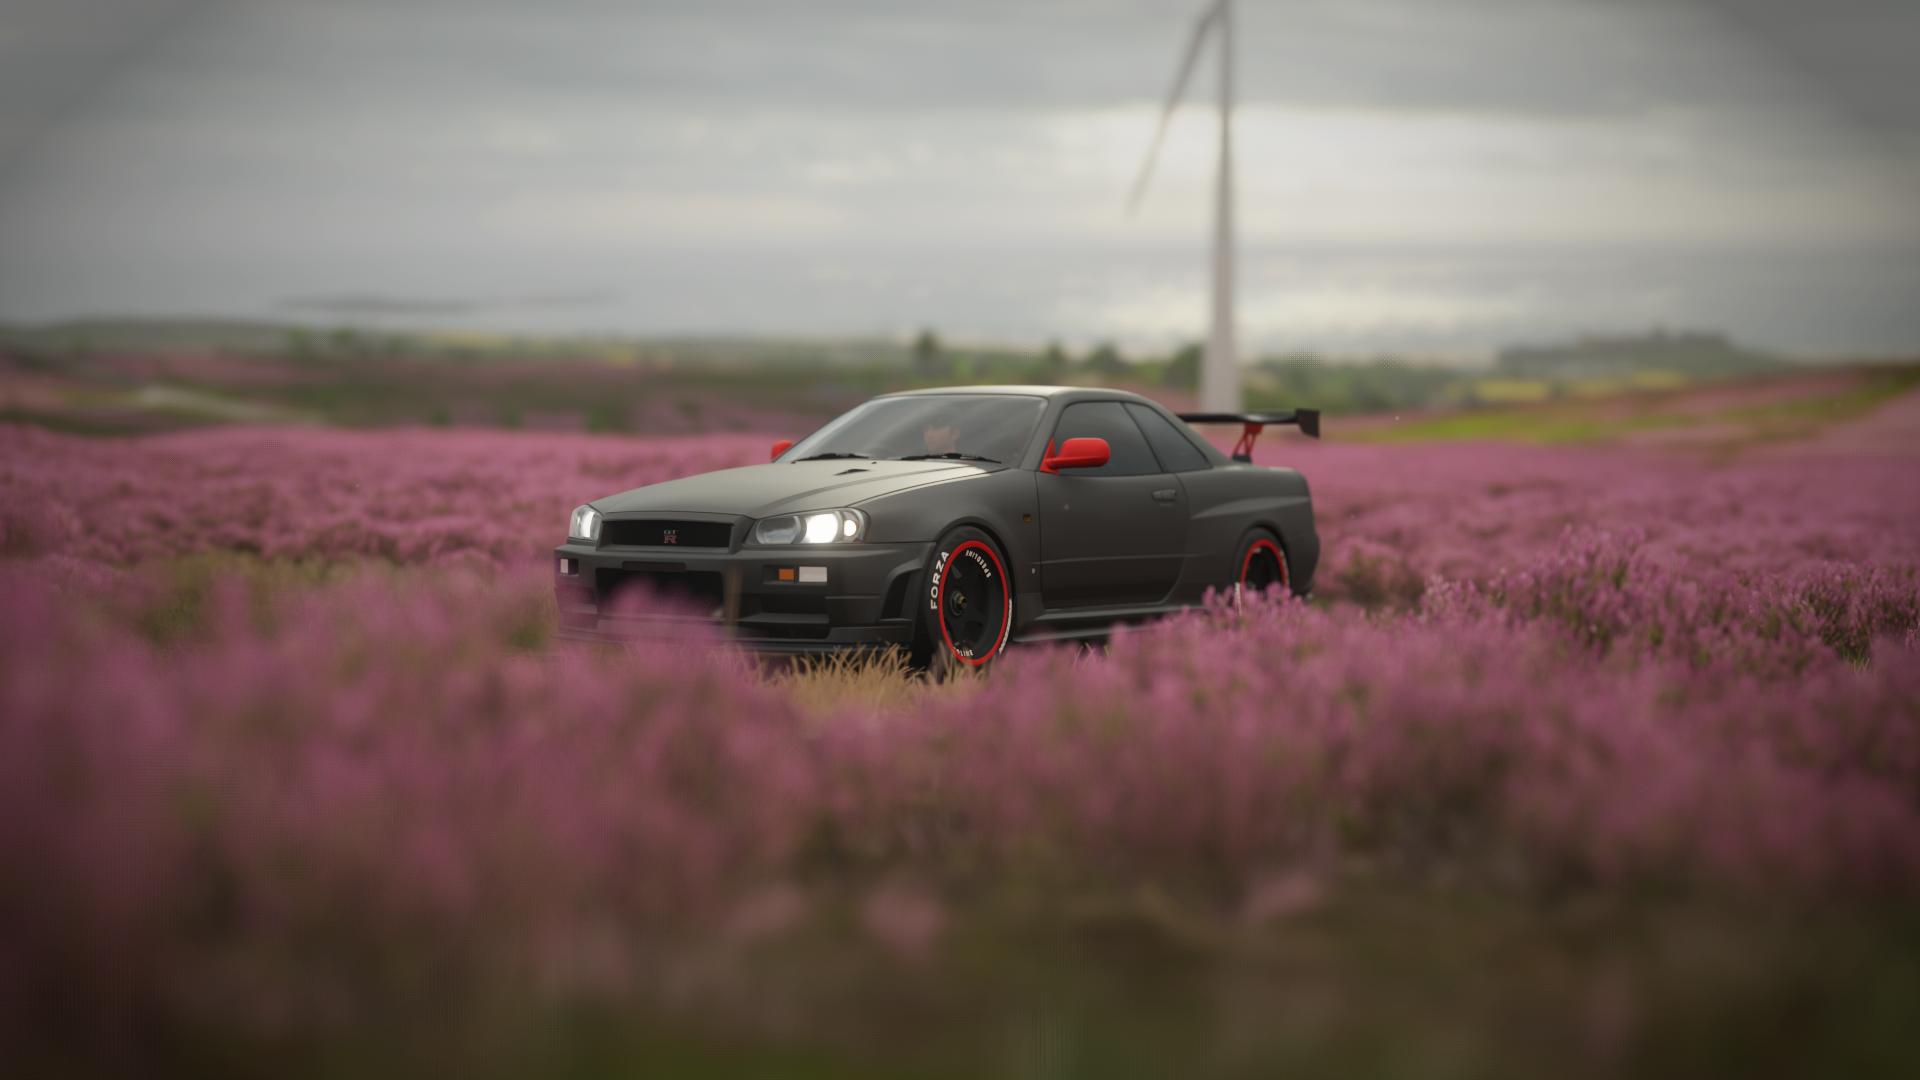 Nissan GTR R34, Nismo, Forza Horizon 4